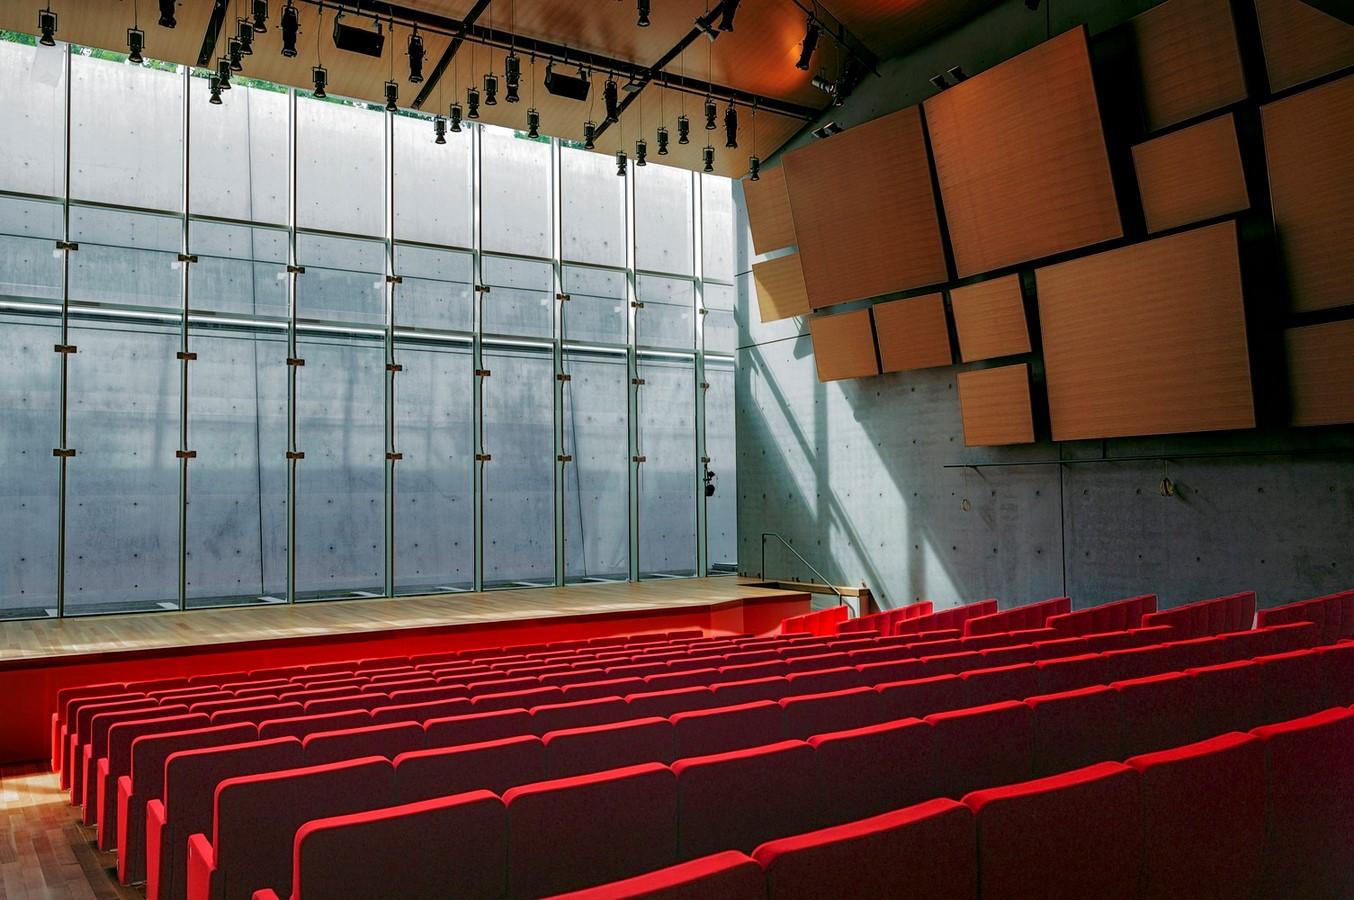 Kimbell Art Museum by Renzo Piano: Mecca of modern architecture - Sheet9